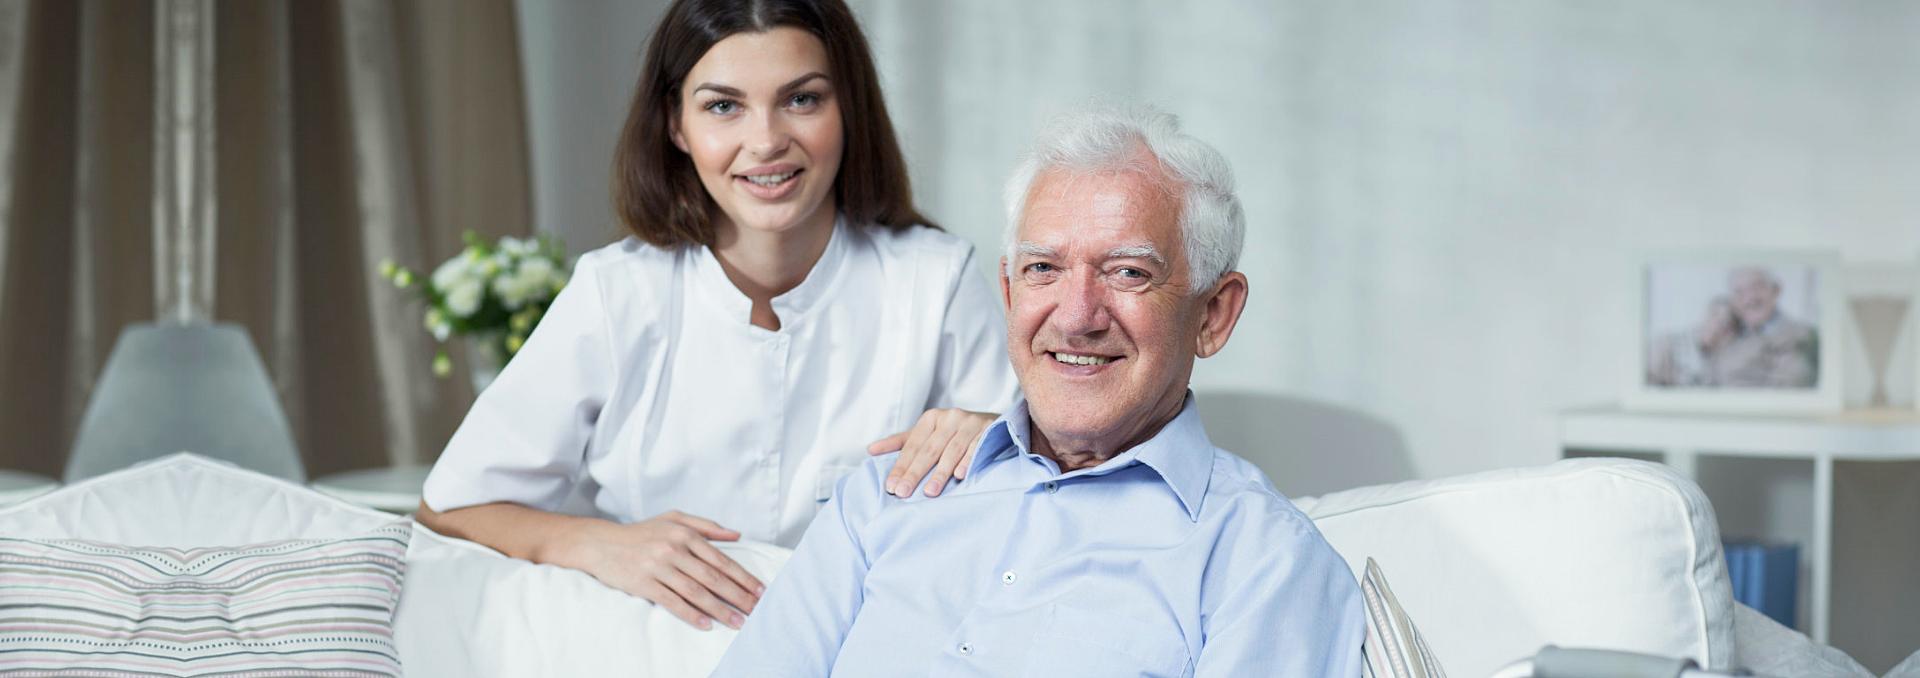 grandpa and his caretaker